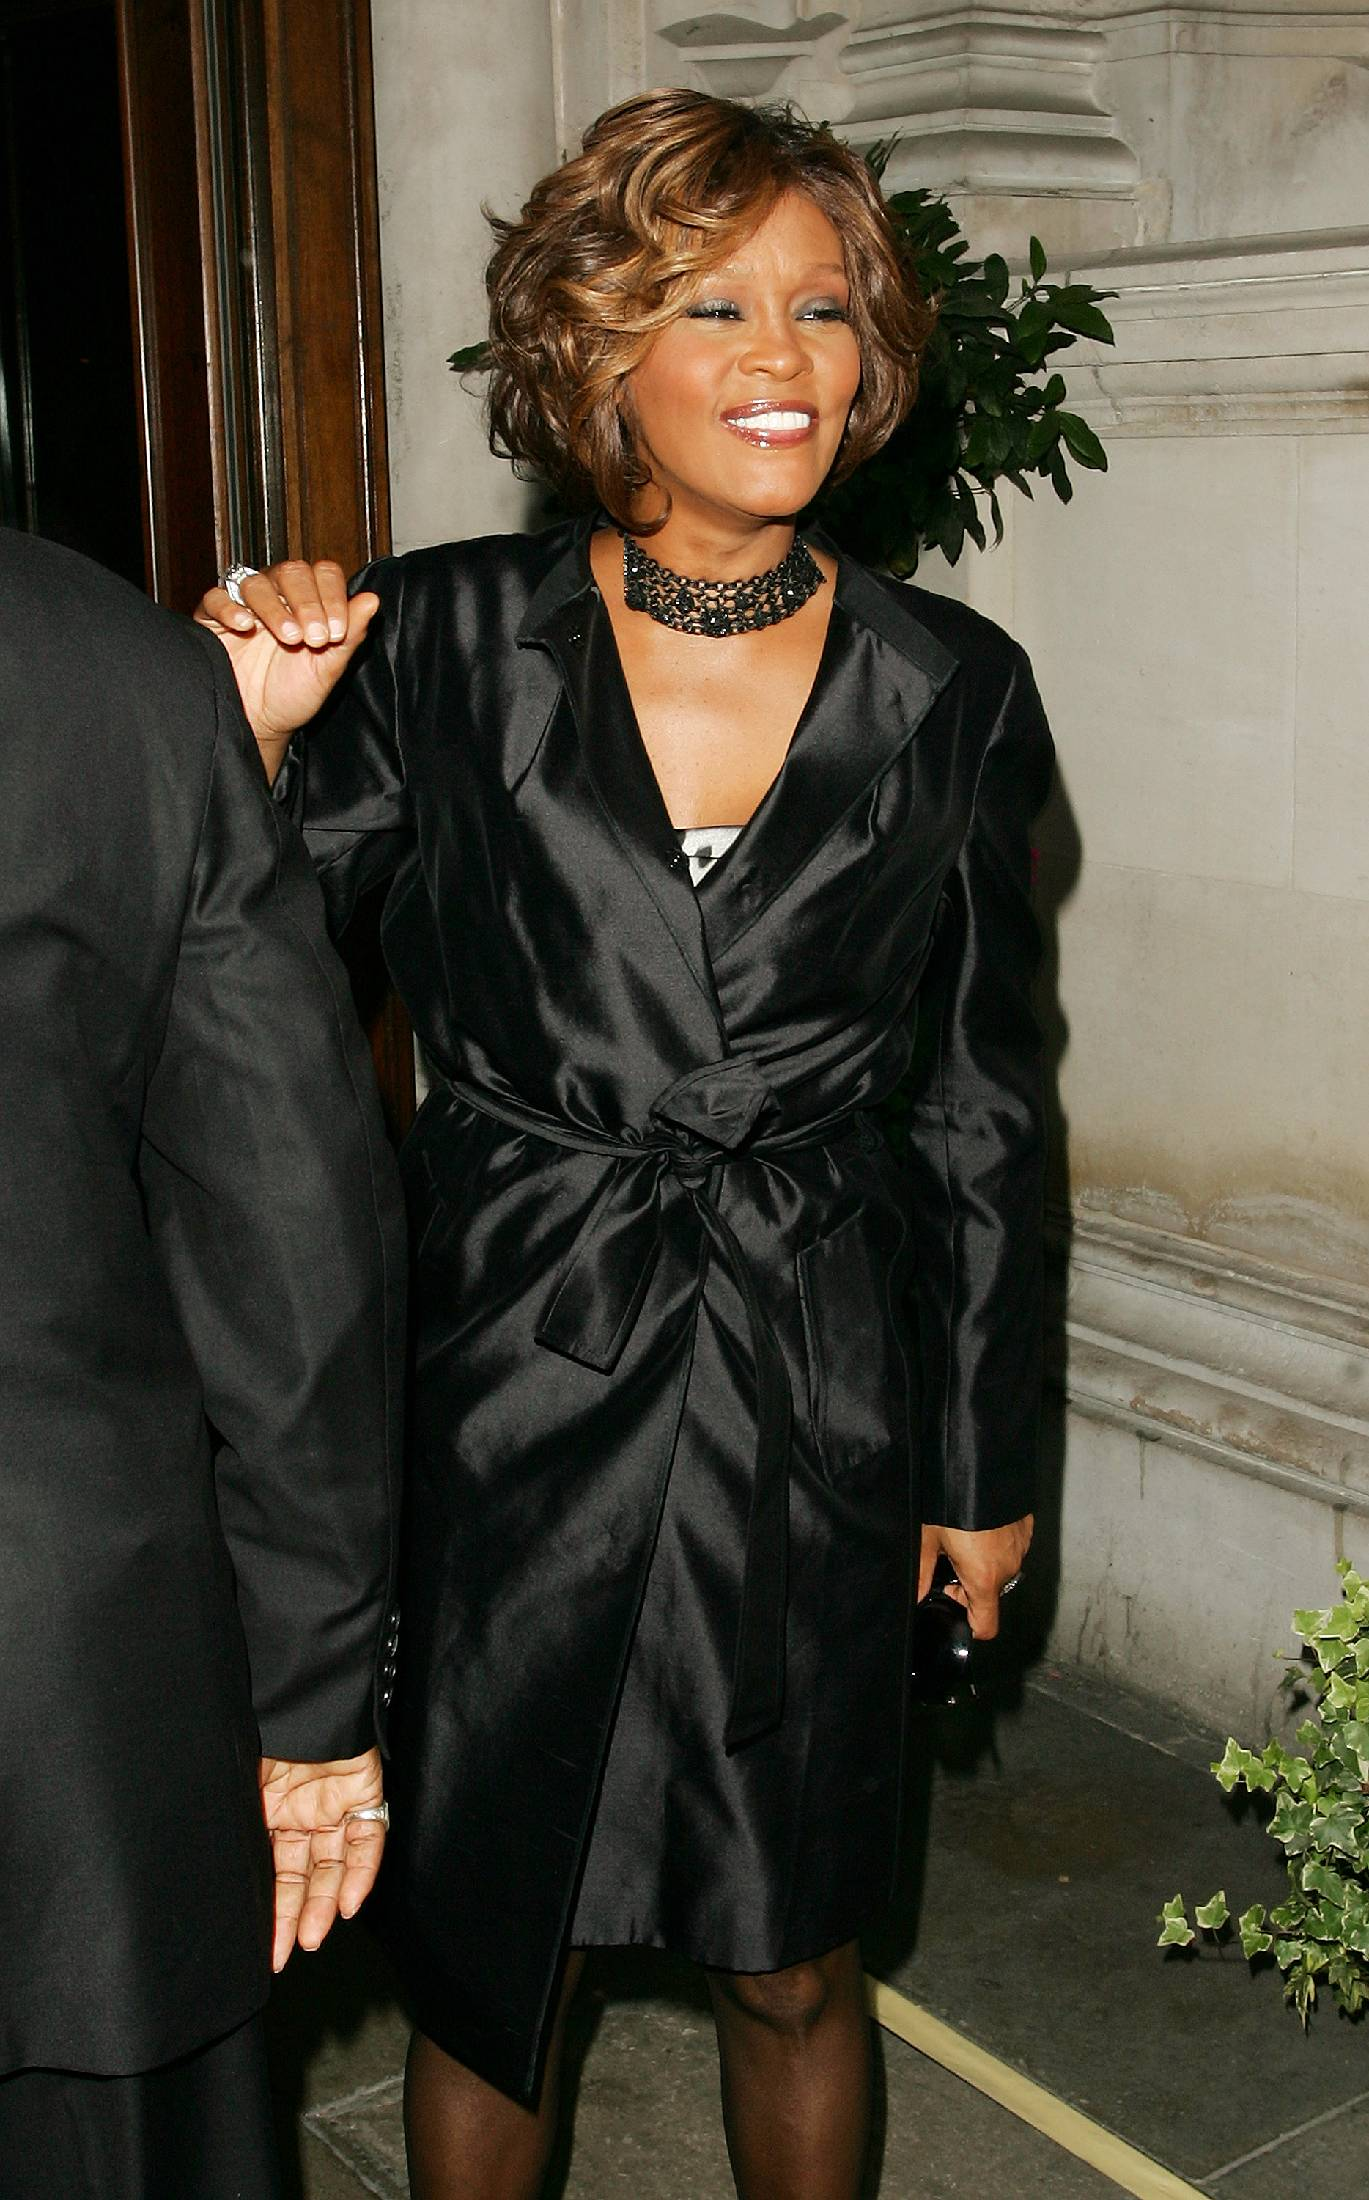 04758_celeb-city.org-The_Elder-Whitney_Houston_2009-07-14_-_arrives_at_a_London_hotel_771_122_501lo.jpg